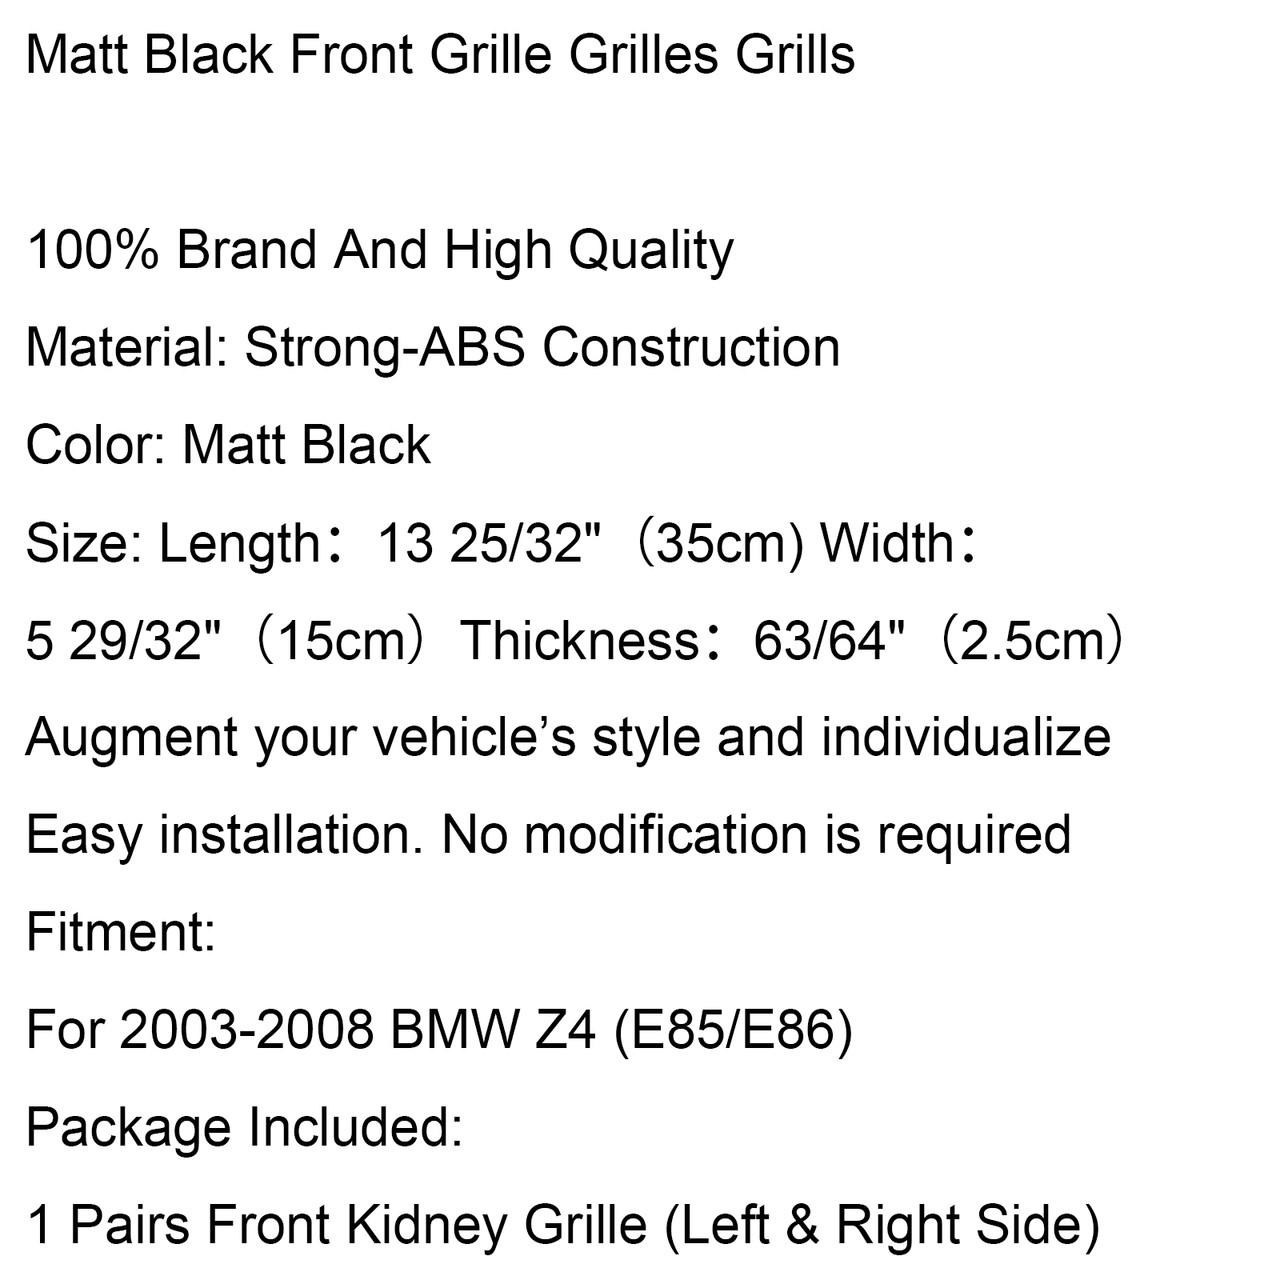 Sports Kidney Grille Grill For BMW Z4 E85 E86 (2003-2008), Matte Black